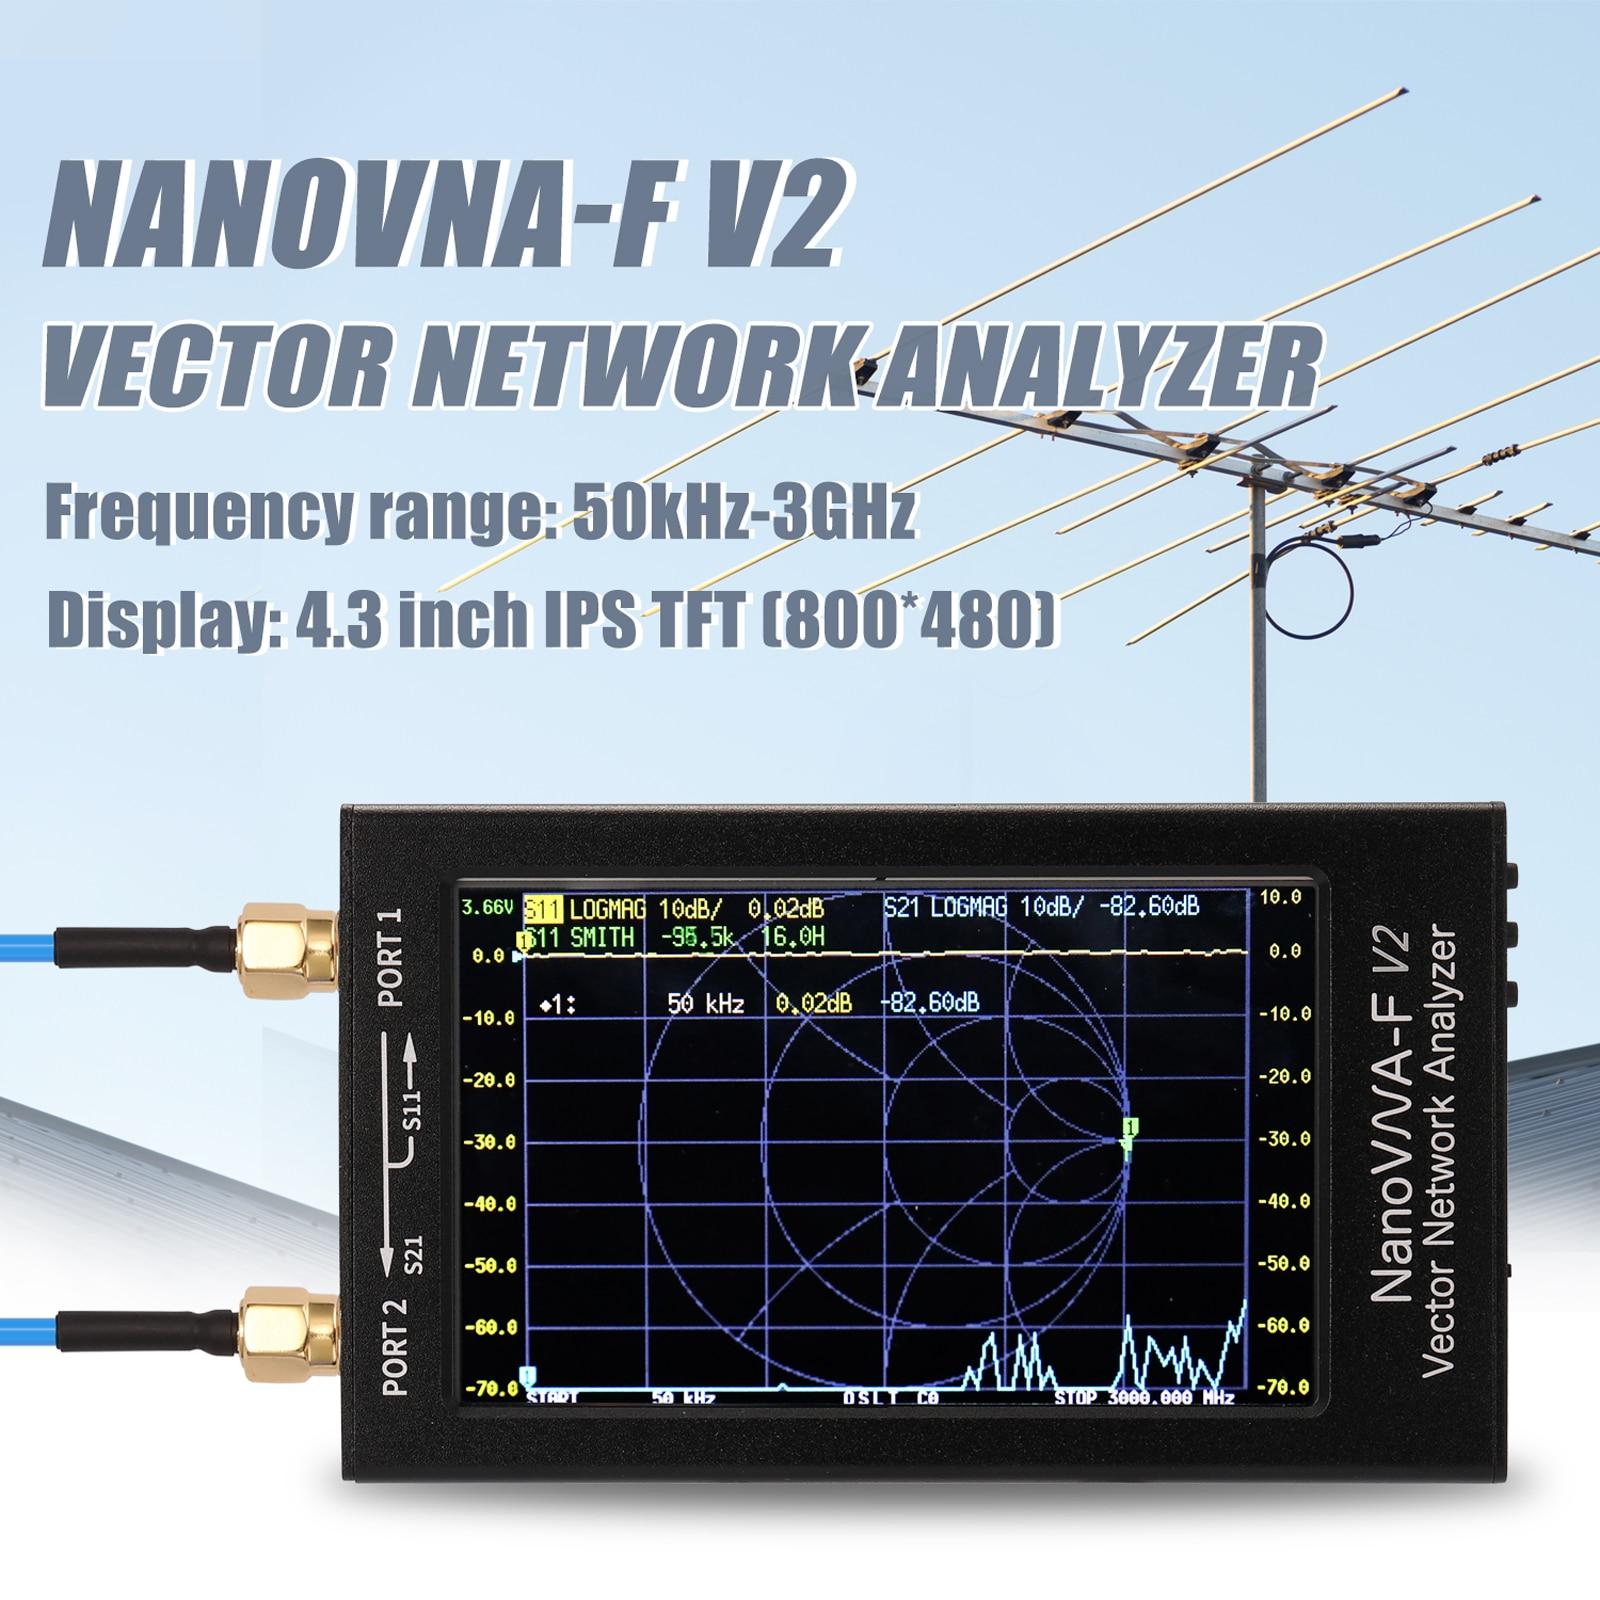 NanoVNA-F V2 شاشة الكريستال السائل ناقلات شبكة محلل 4.3 بوصة IPS الطيف محلل S-A-A-2 هوائي محلل موجة قصيرة HF VHF UHF